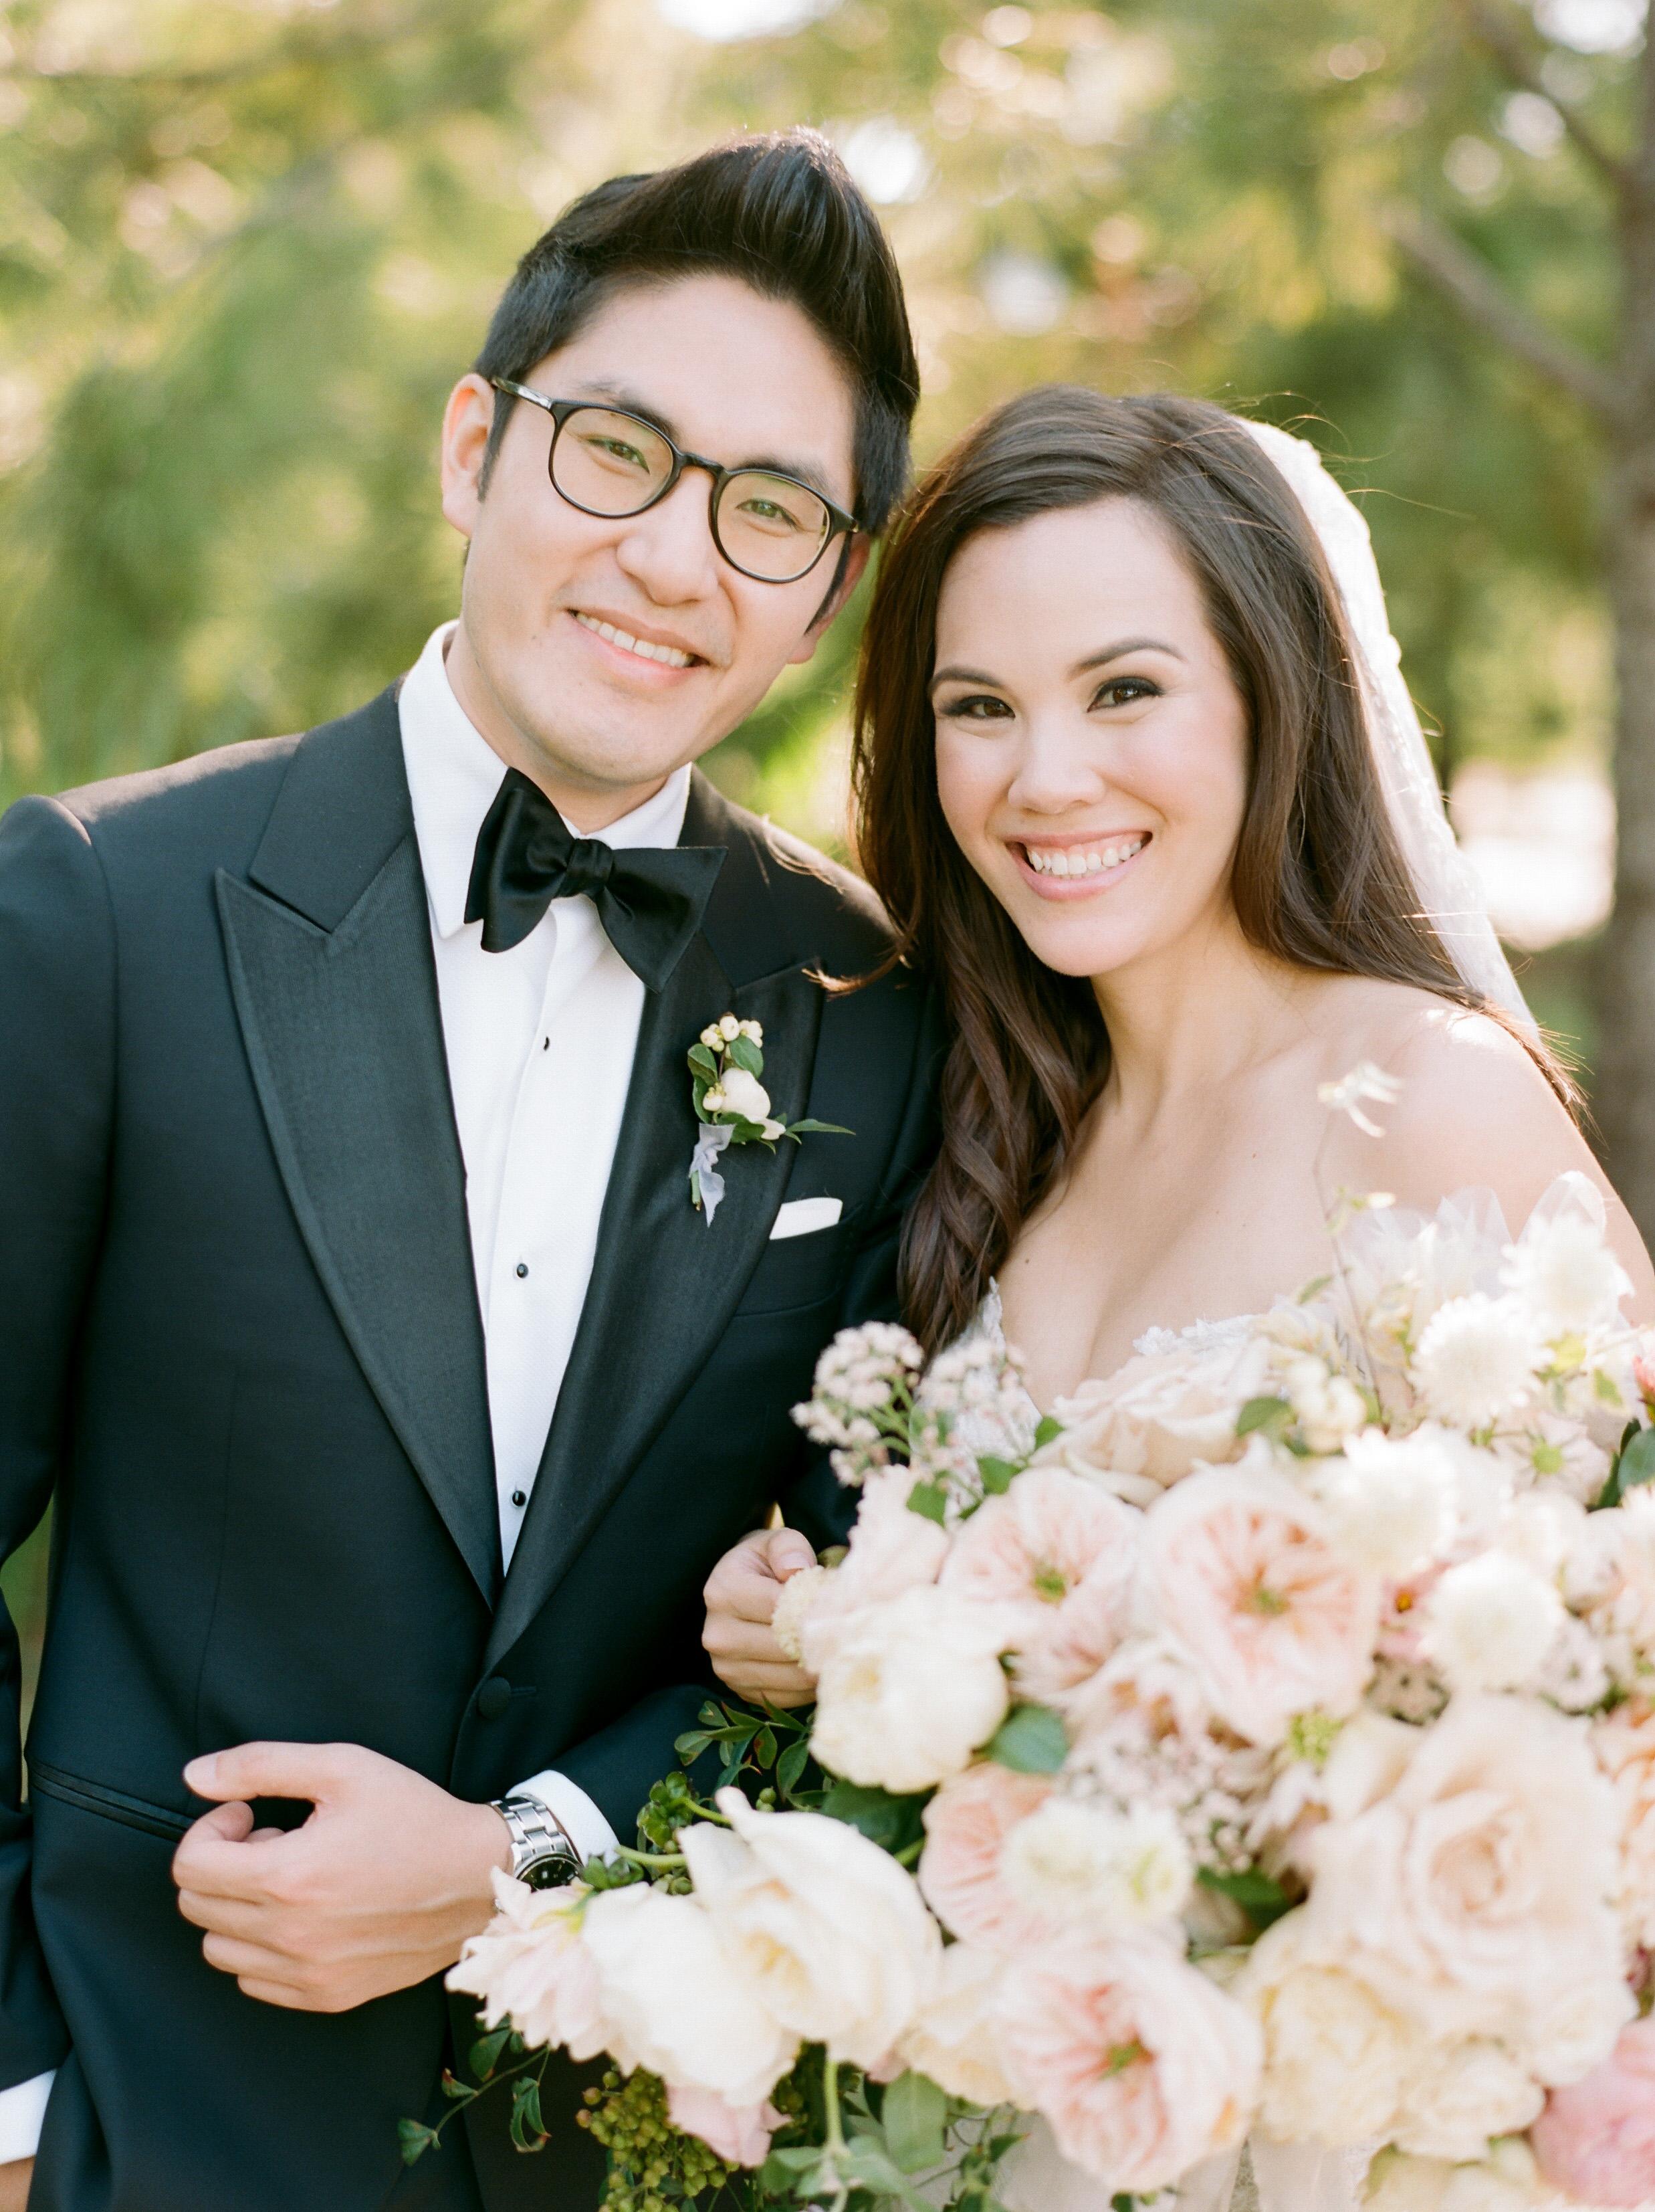 texas wedding couple smiling